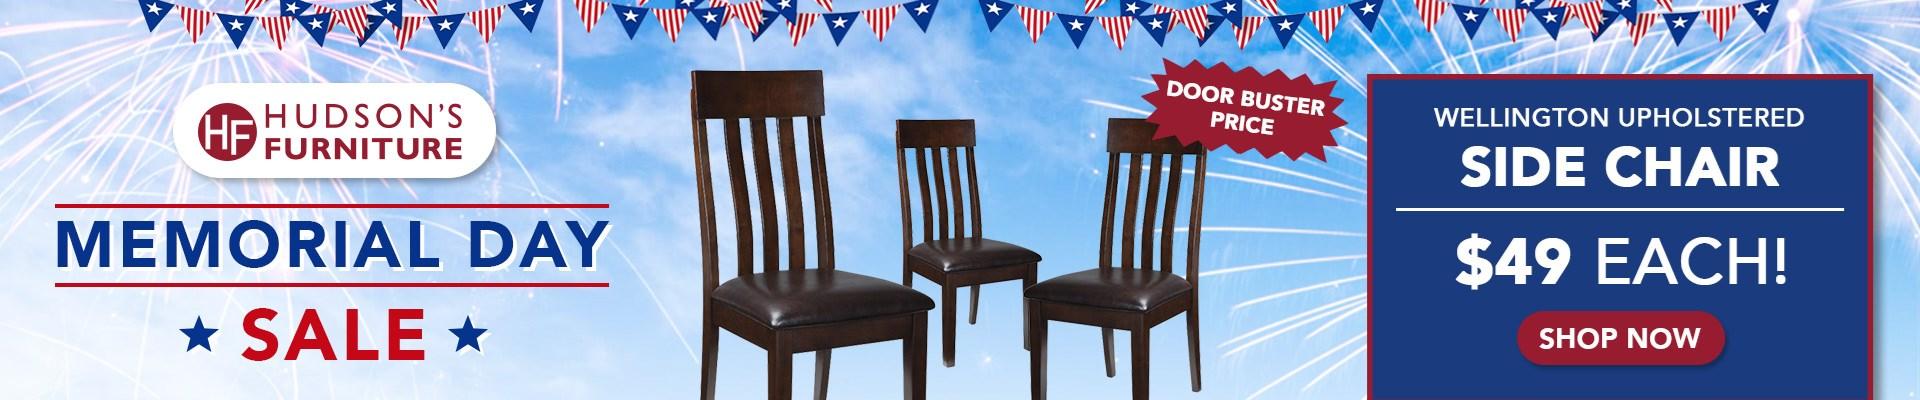 Wellington Upholstered Side Chair Hudson's Furniture Sale